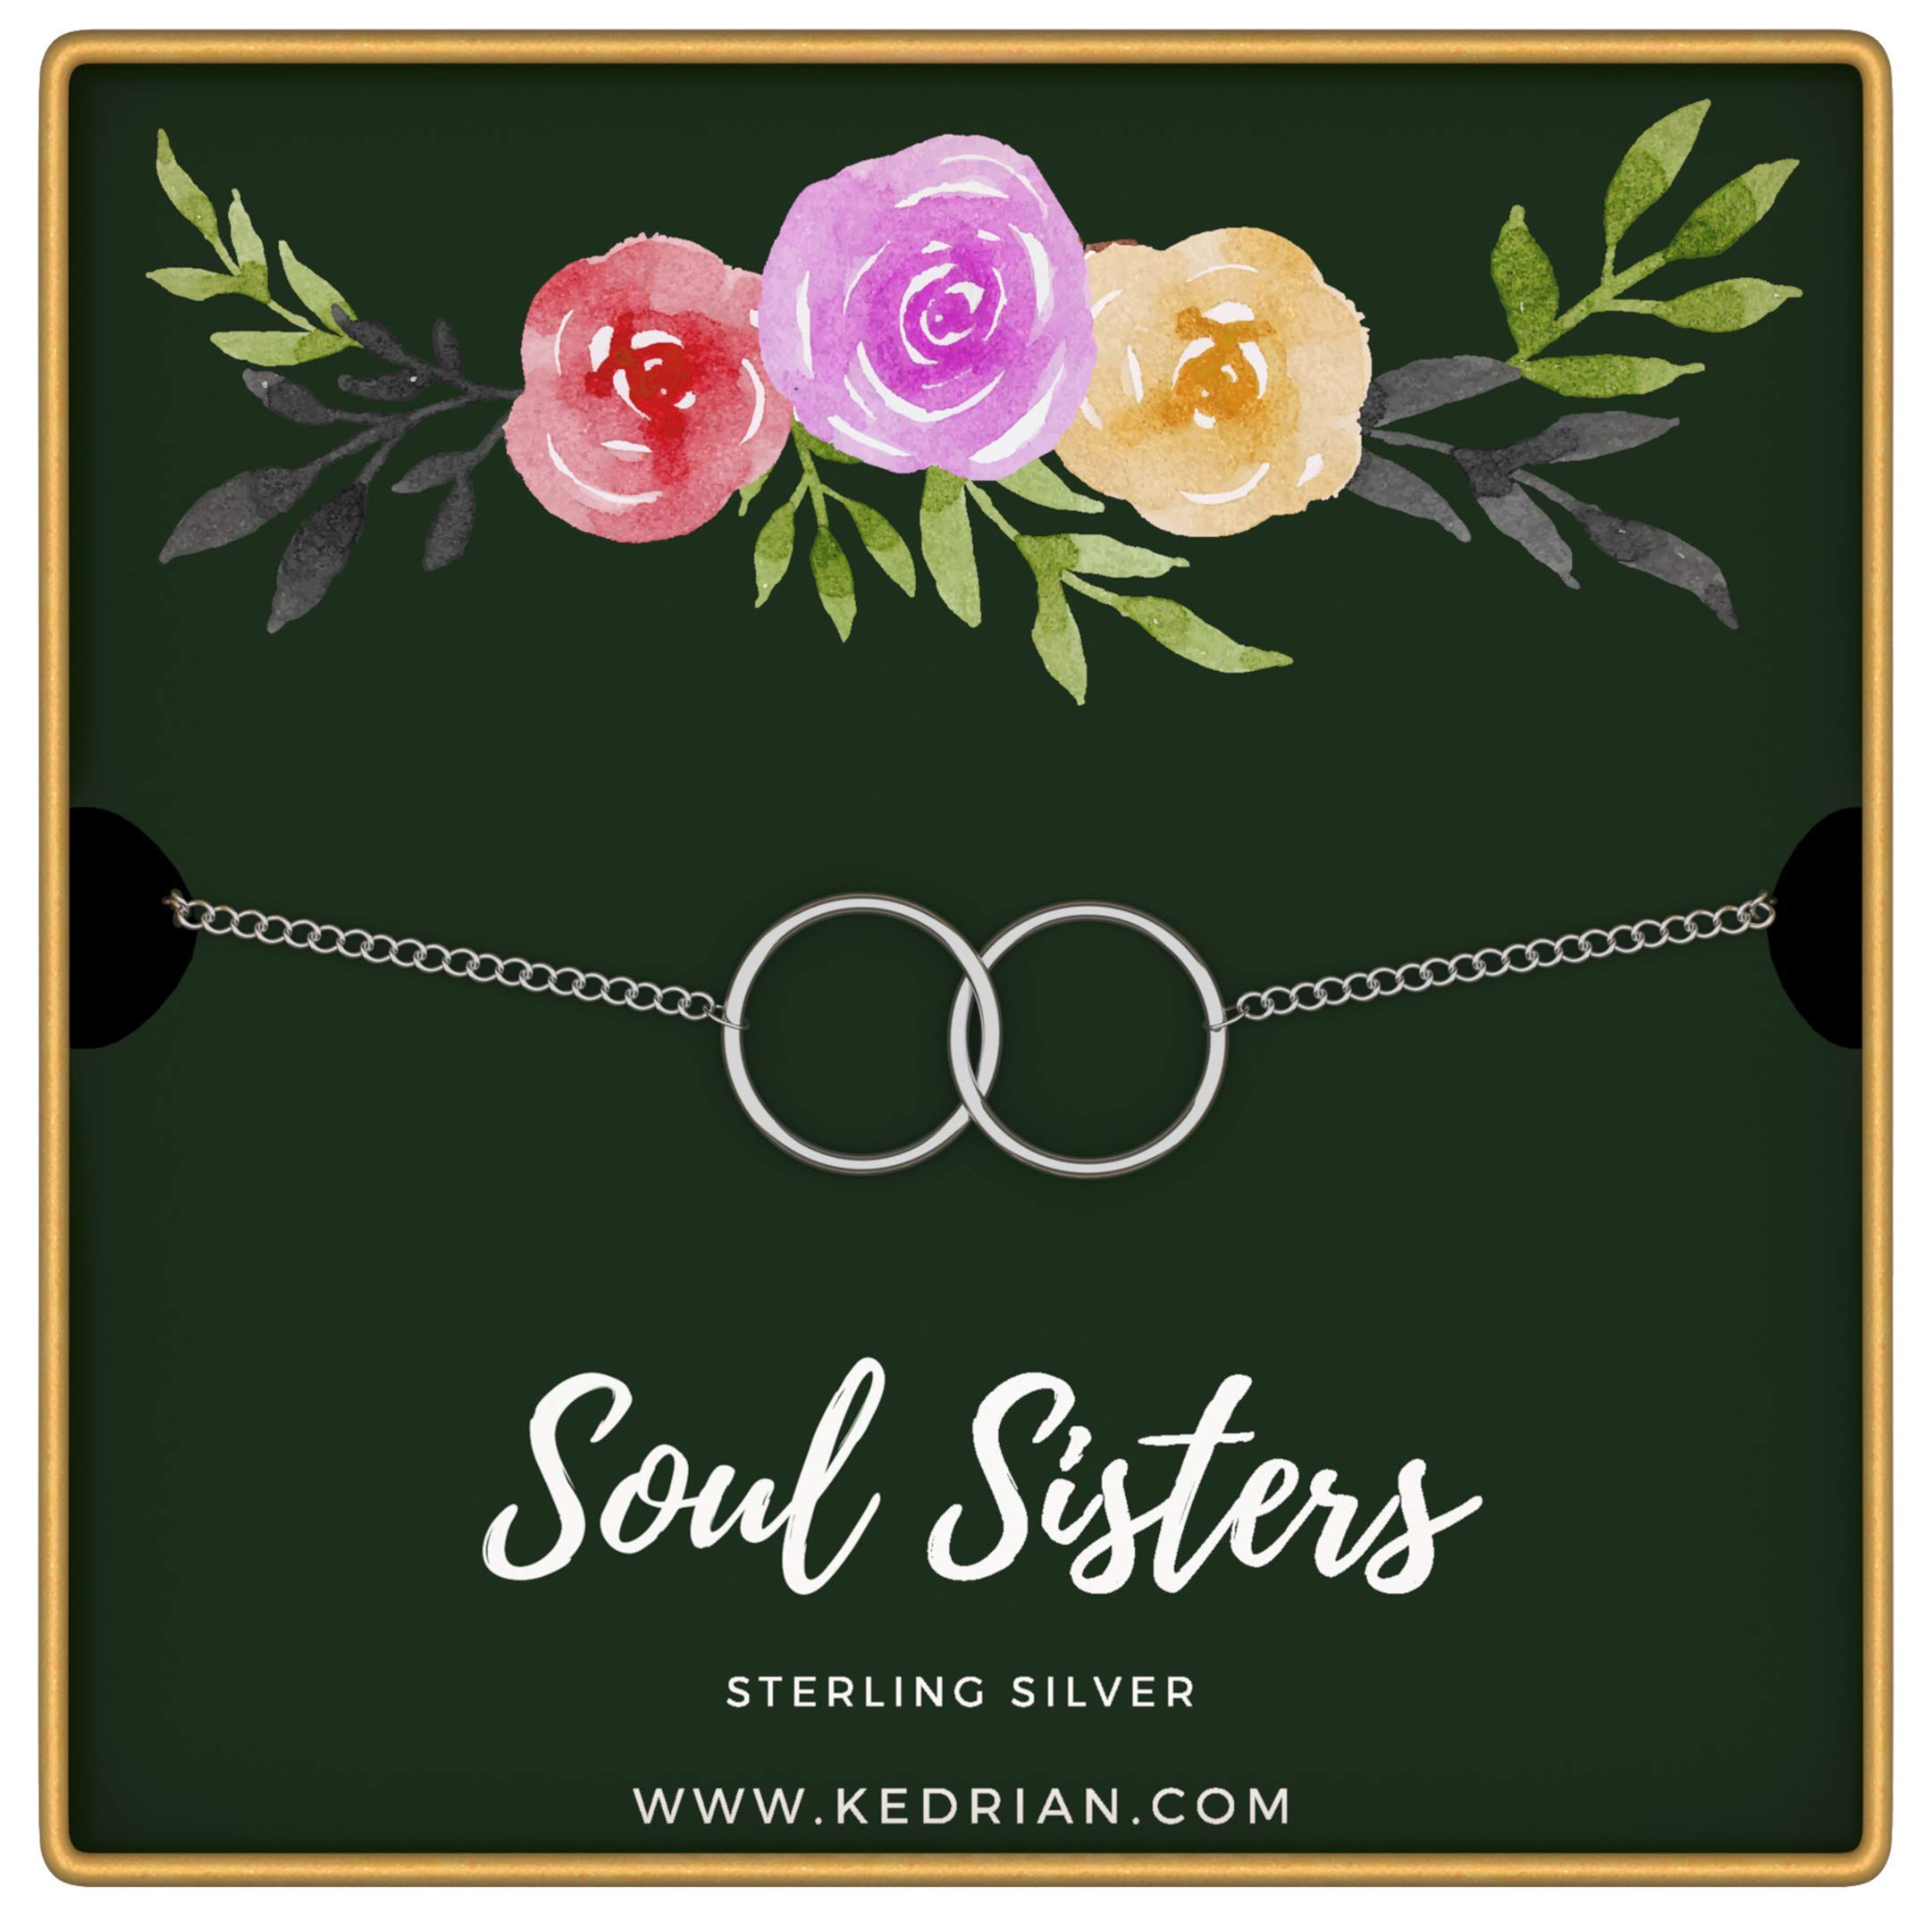 KEDRIAN Soul Sisters Bracelet, 925 Sterling Silver, Friendship Bracelet, Best Friend Bracelet, Best Friend Gifts For Women, Friendship Gifts For Women (Soul Sisters - Green) by KEDRIAN